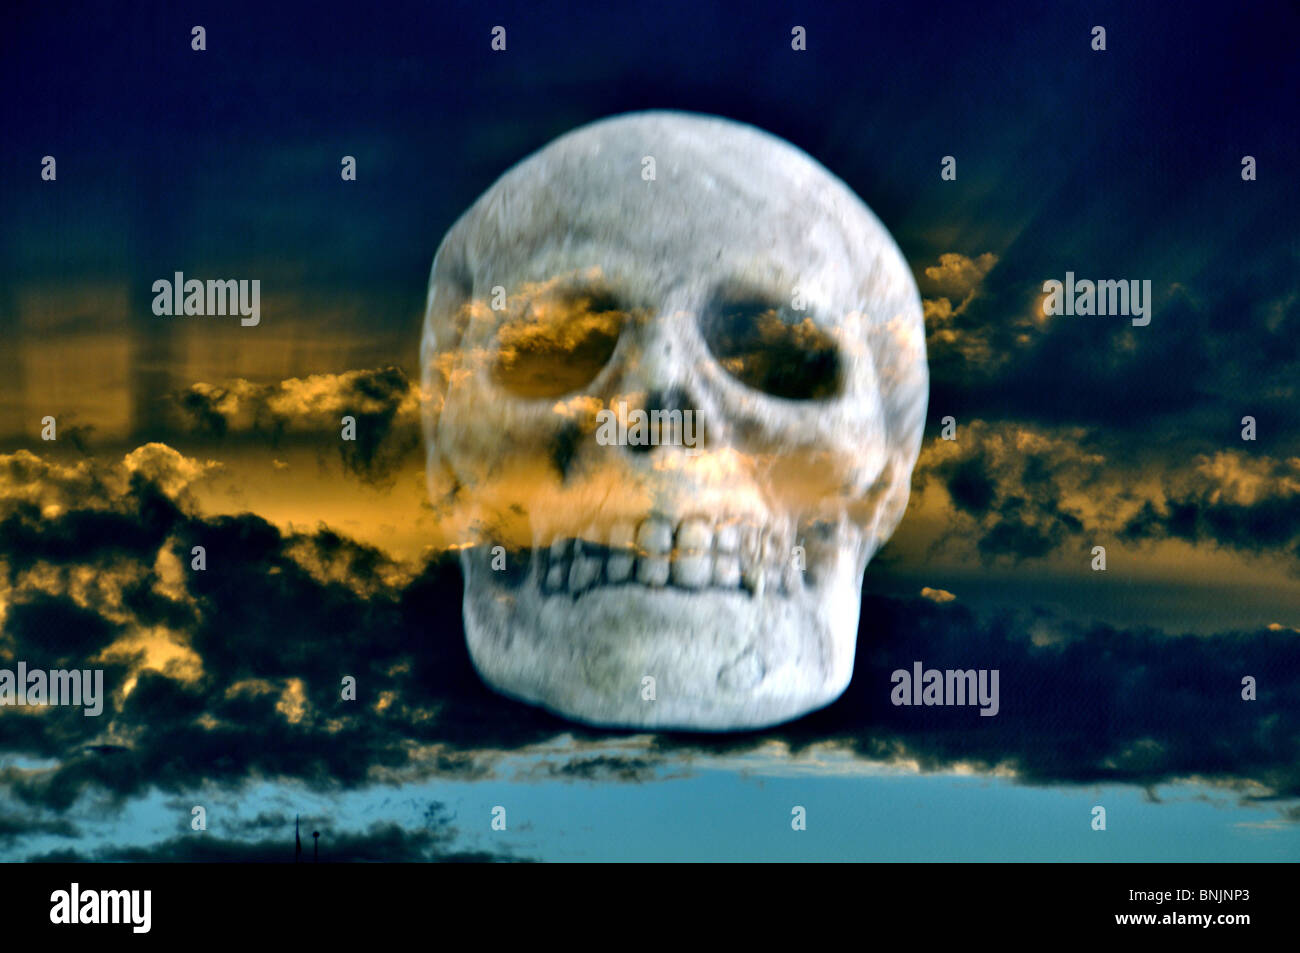 Advertencia de tormenta nubes Skull muerte peligroso concepto cabeza moribundo apocalipsis Foto de stock